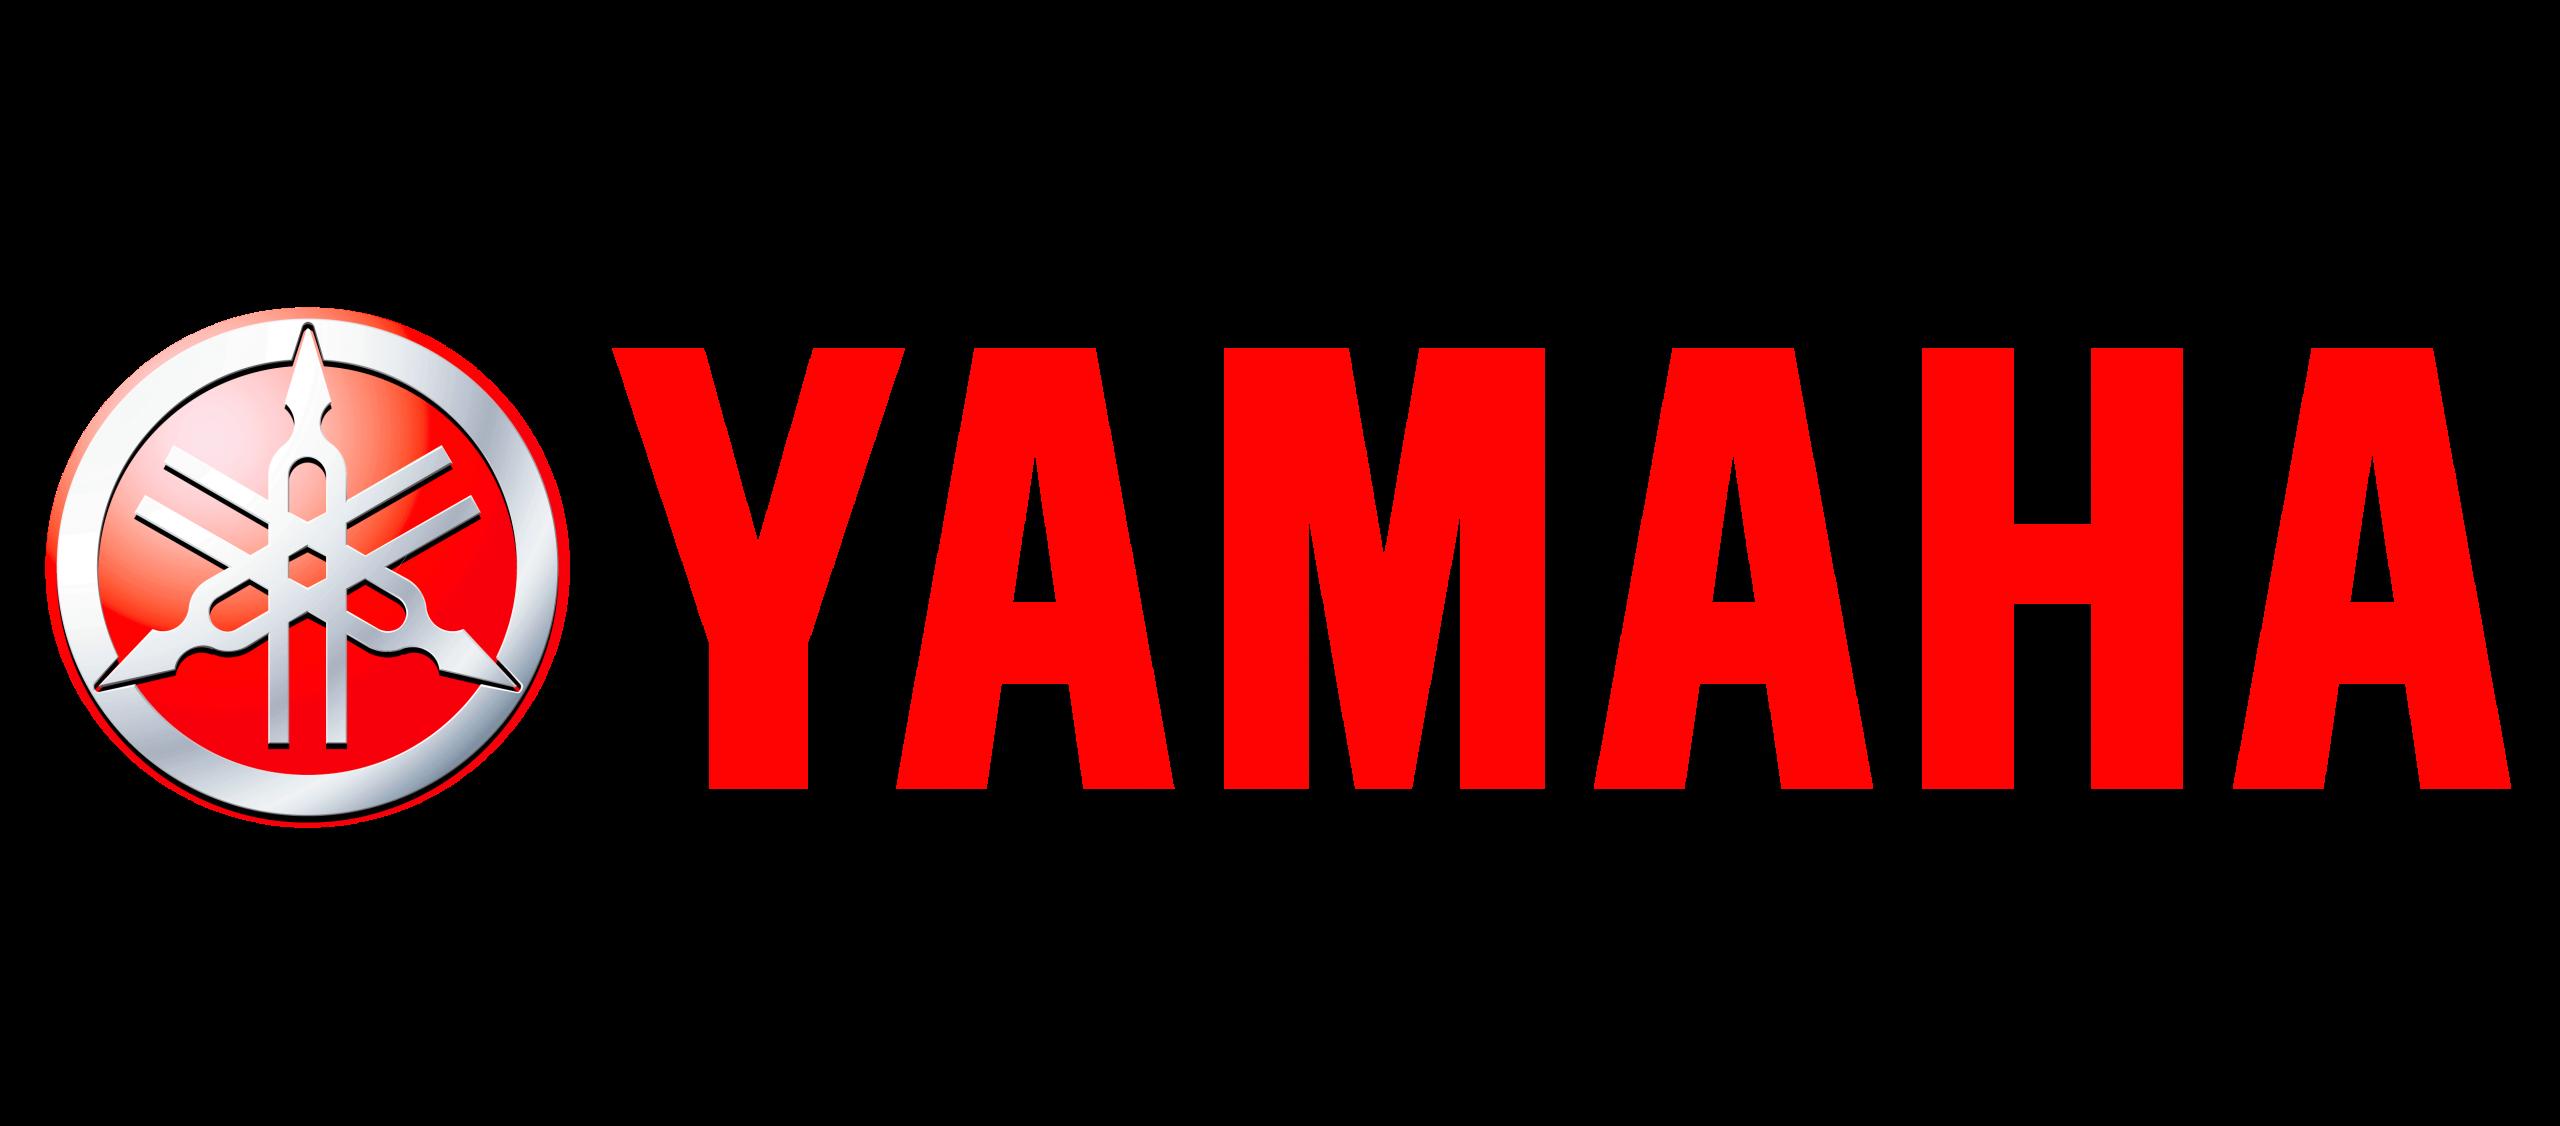 yamaha-logo-motorcycle-brands-png-3